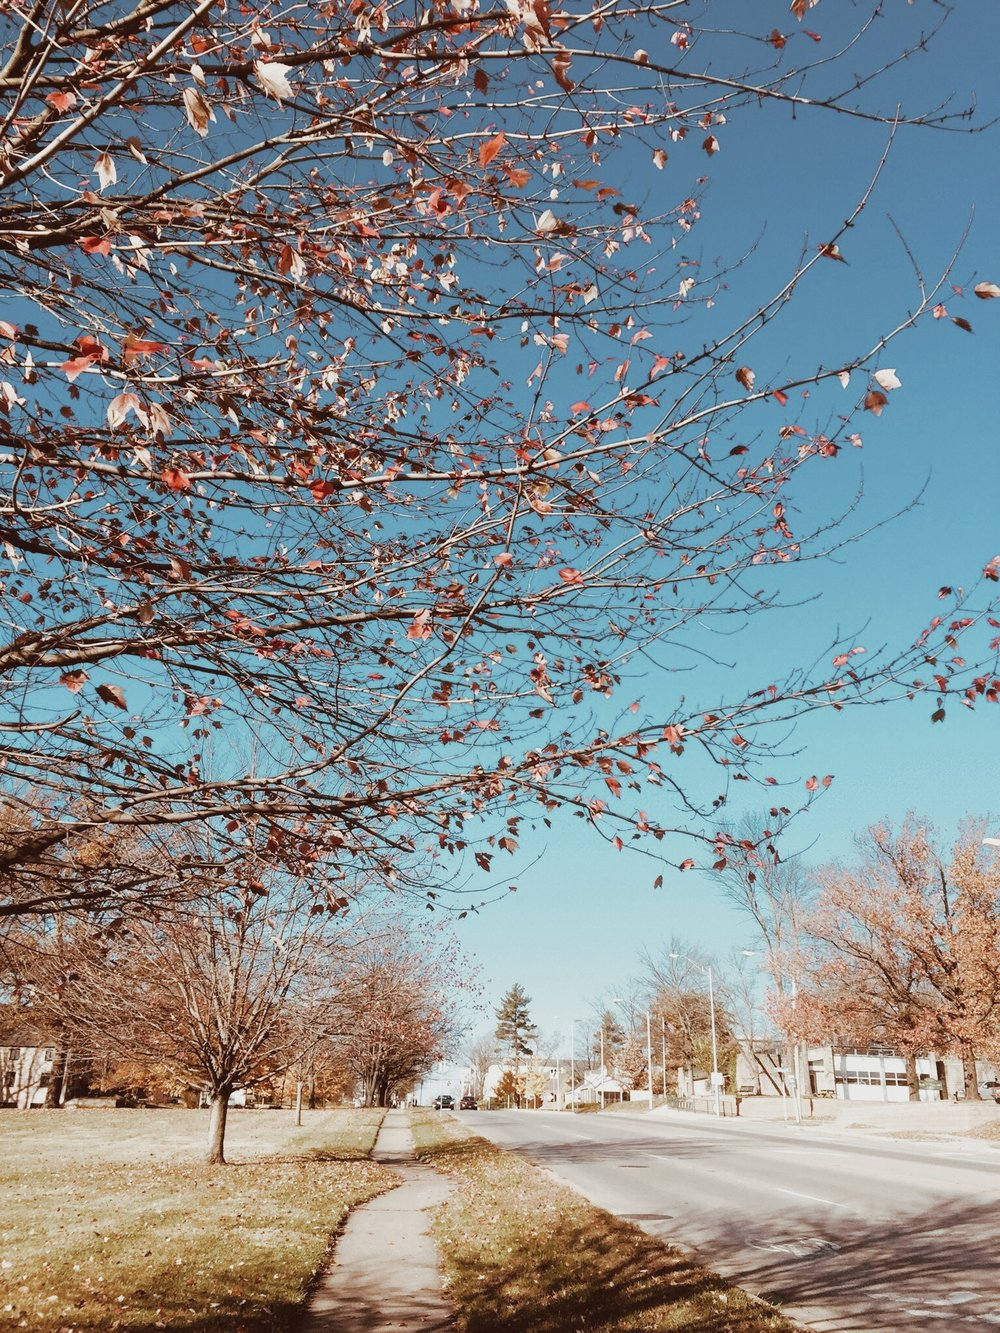 Indiana University / 印第安納大學的秋天